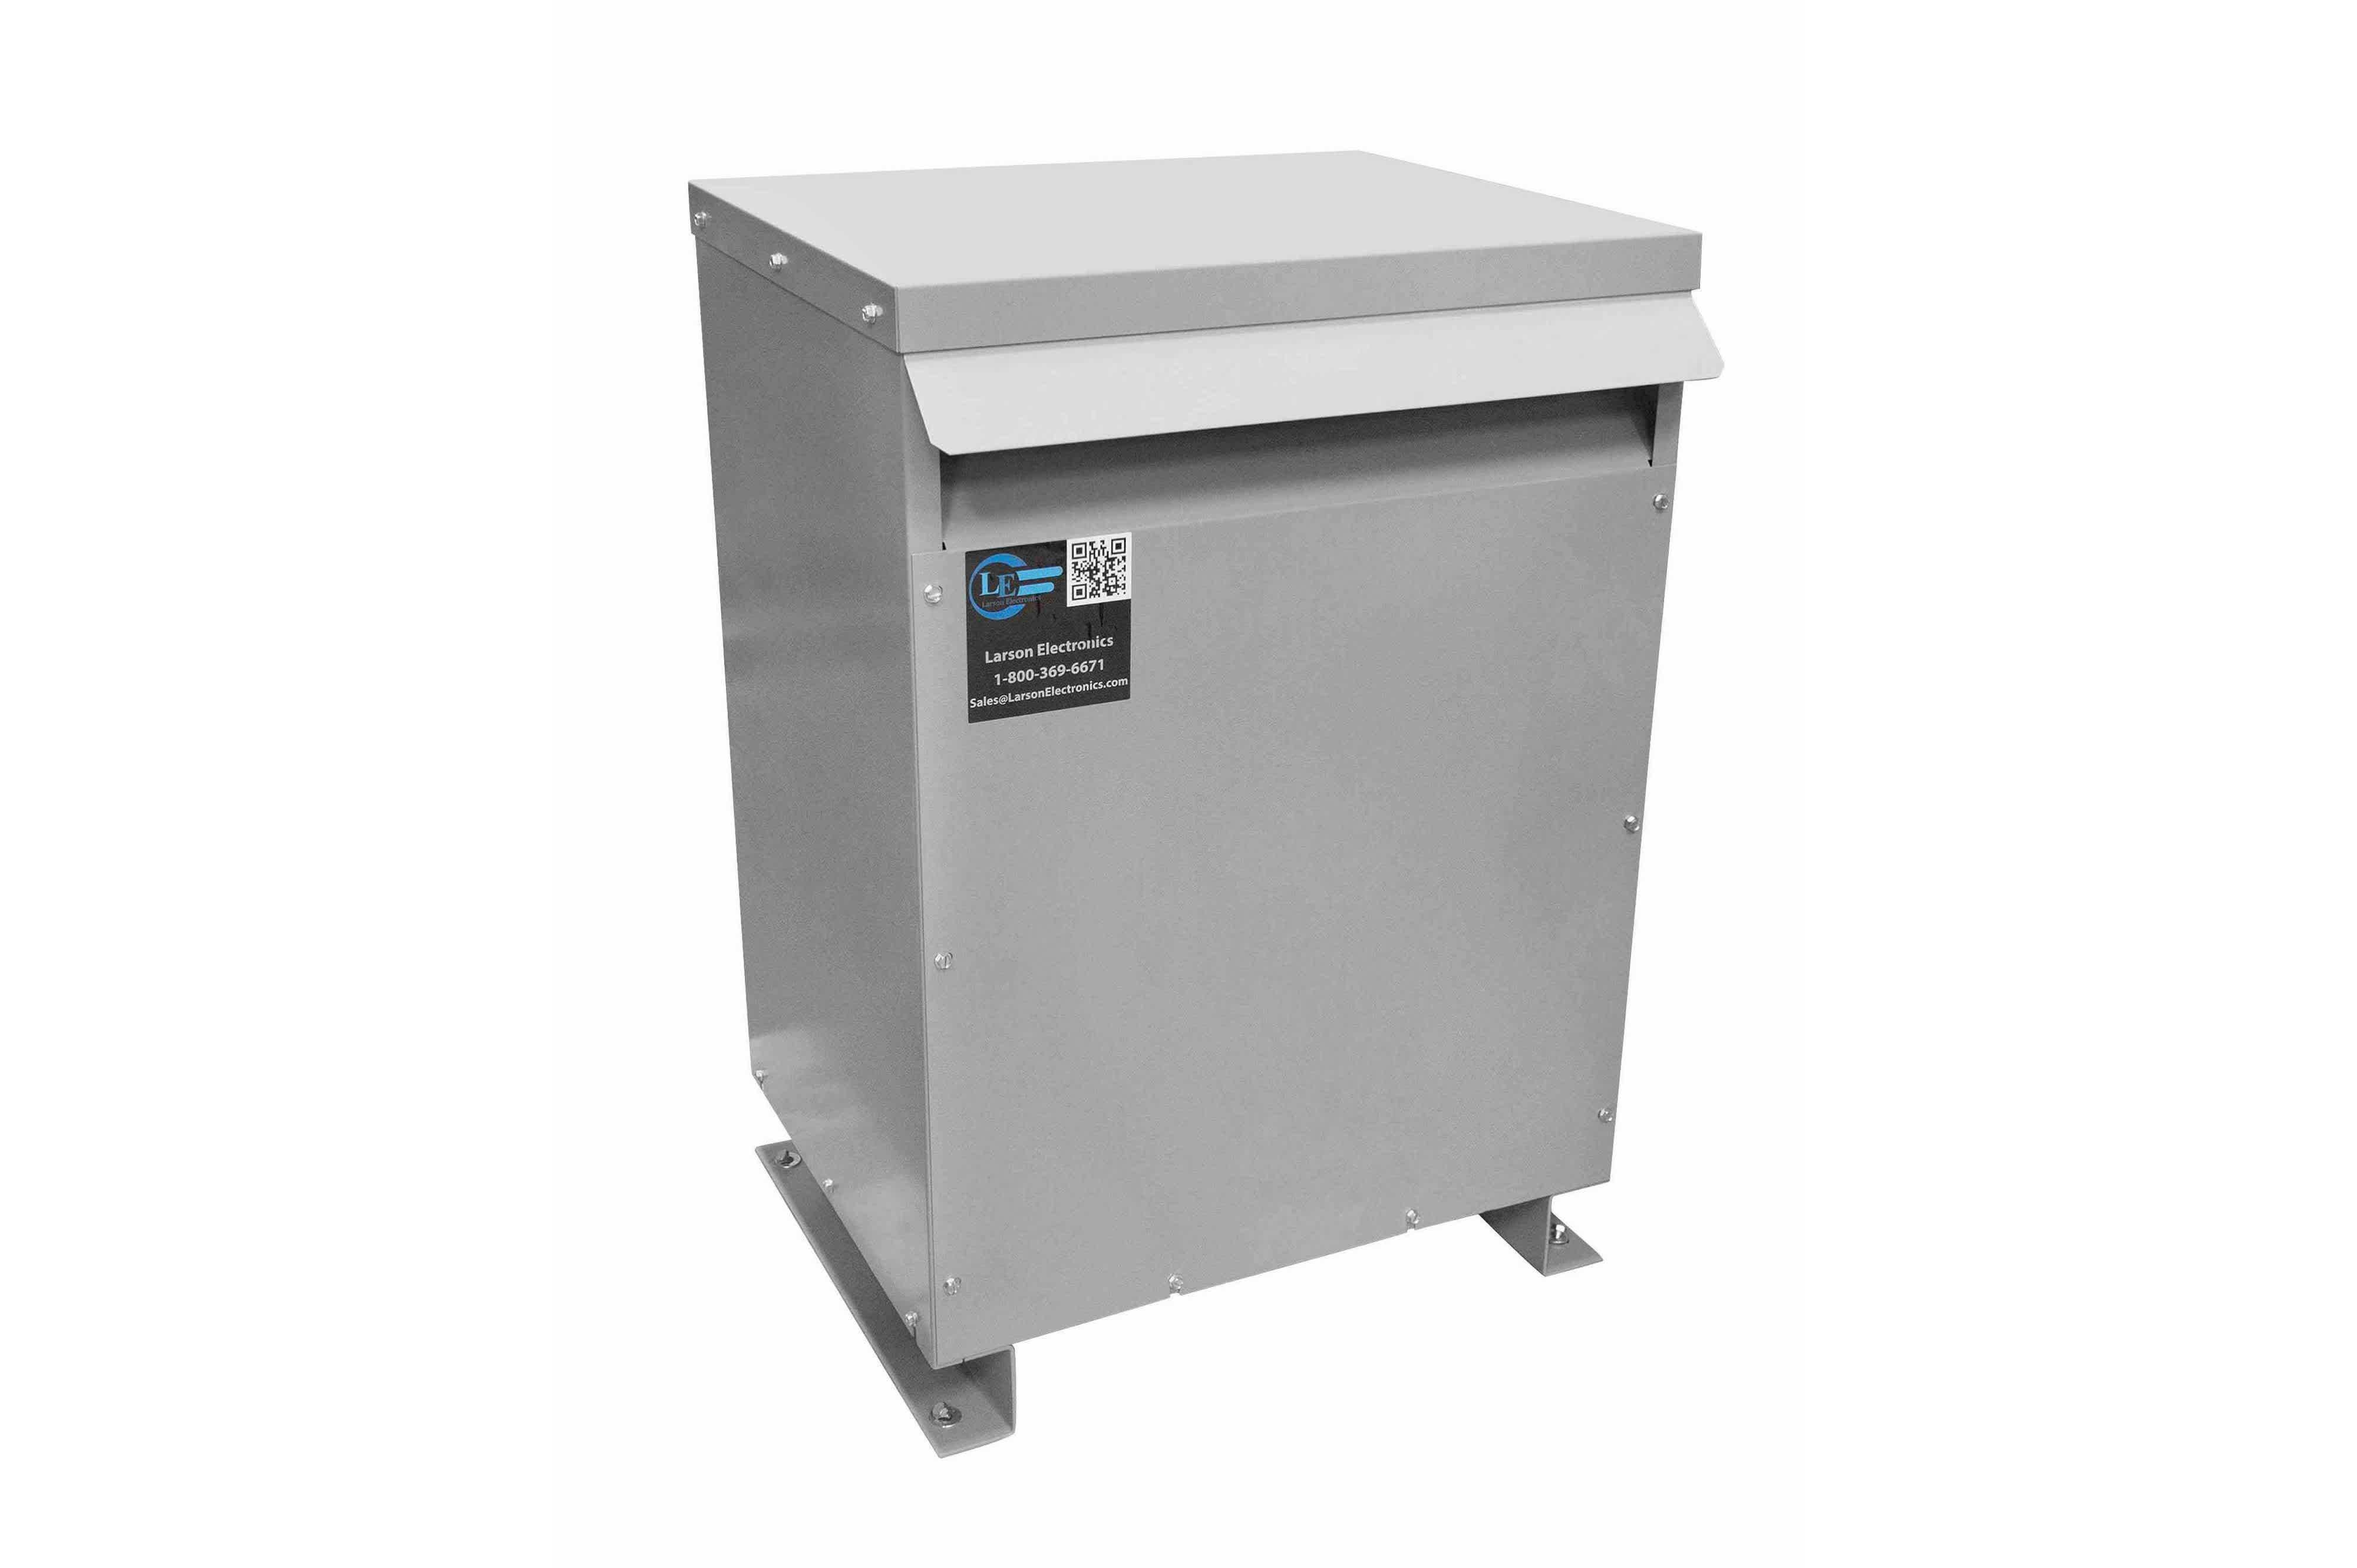 14 kVA 3PH Isolation Transformer, 415V Wye Primary, 480Y/277 Wye-N Secondary, N3R, Ventilated, 60 Hz